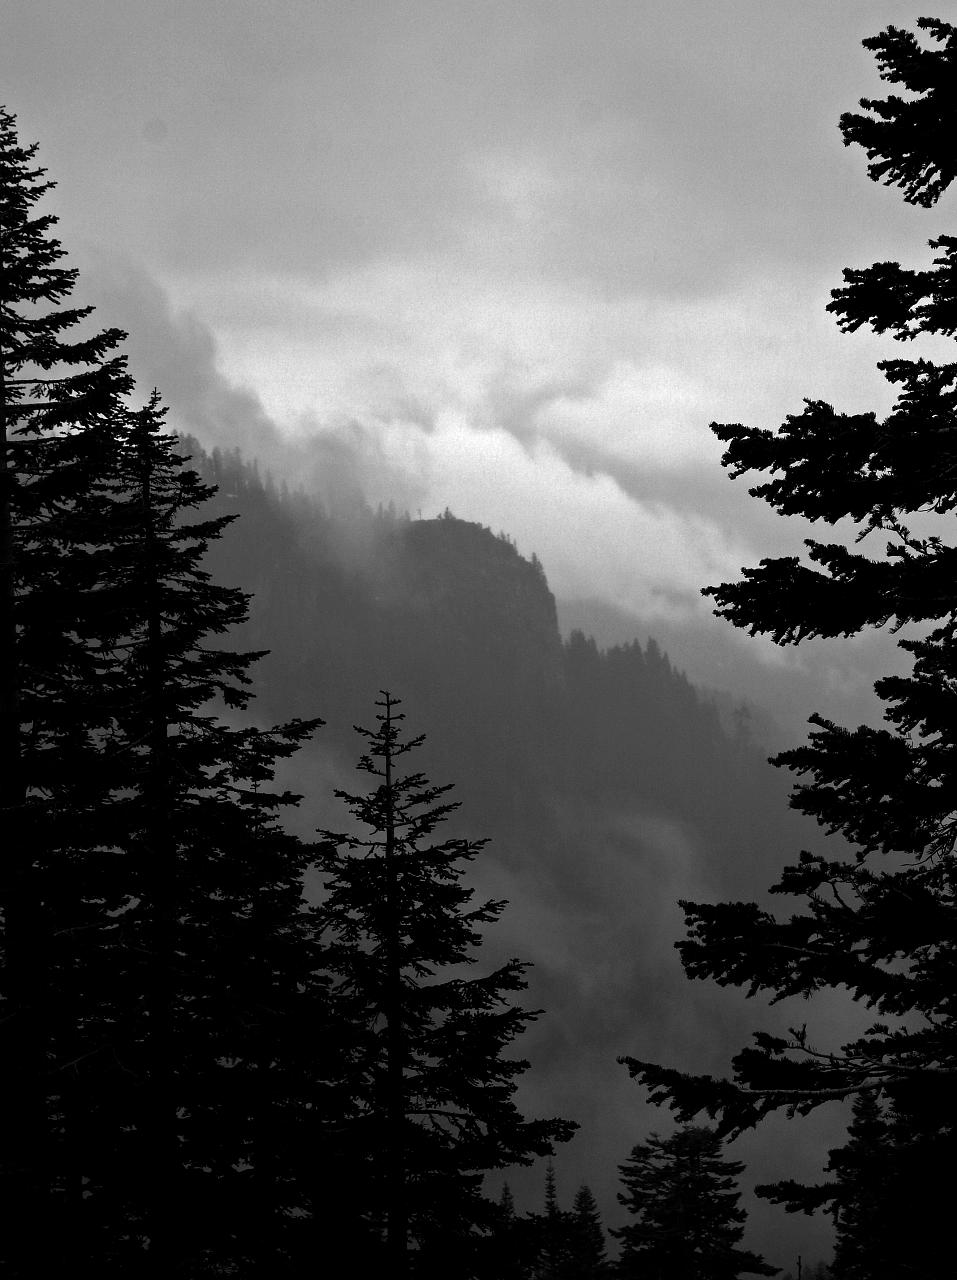 lassen-volcanic-national-park3a_2698375103_o.jpg